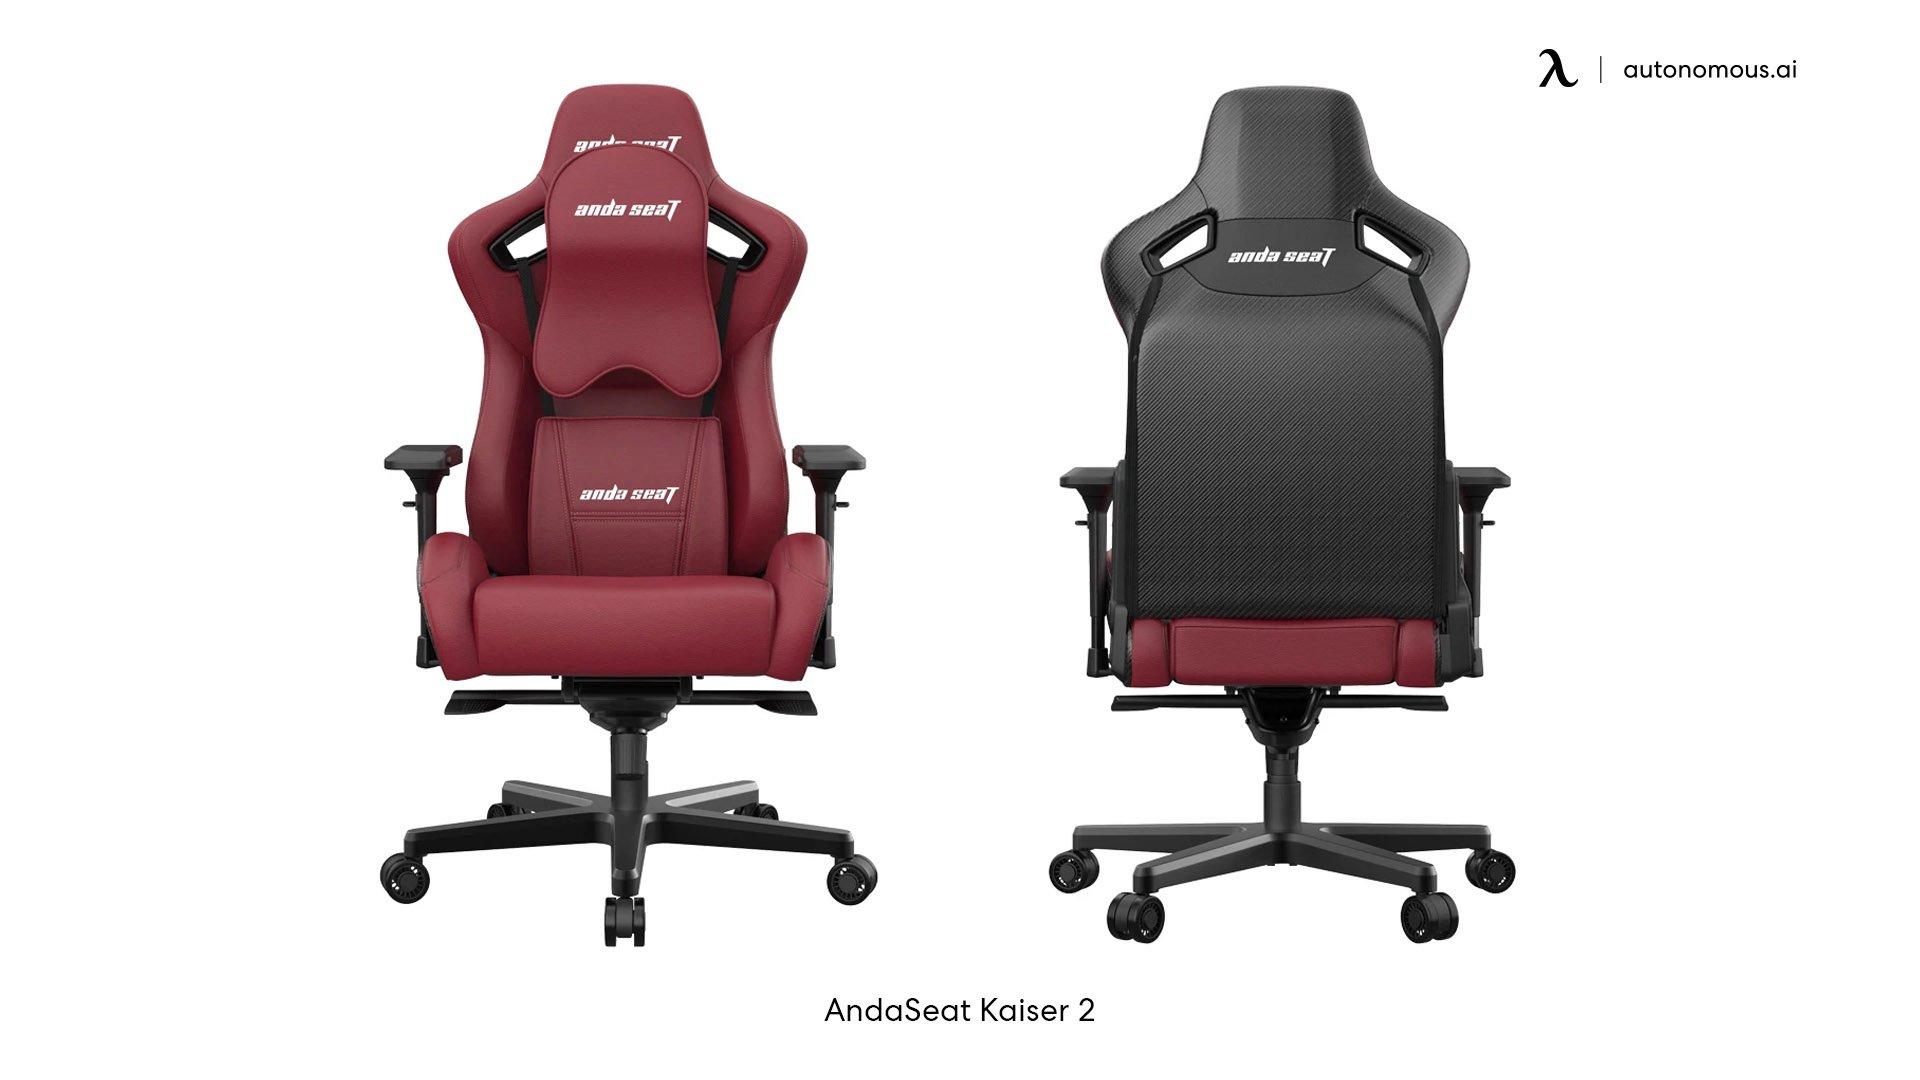 AndaSeat Kaiser Two